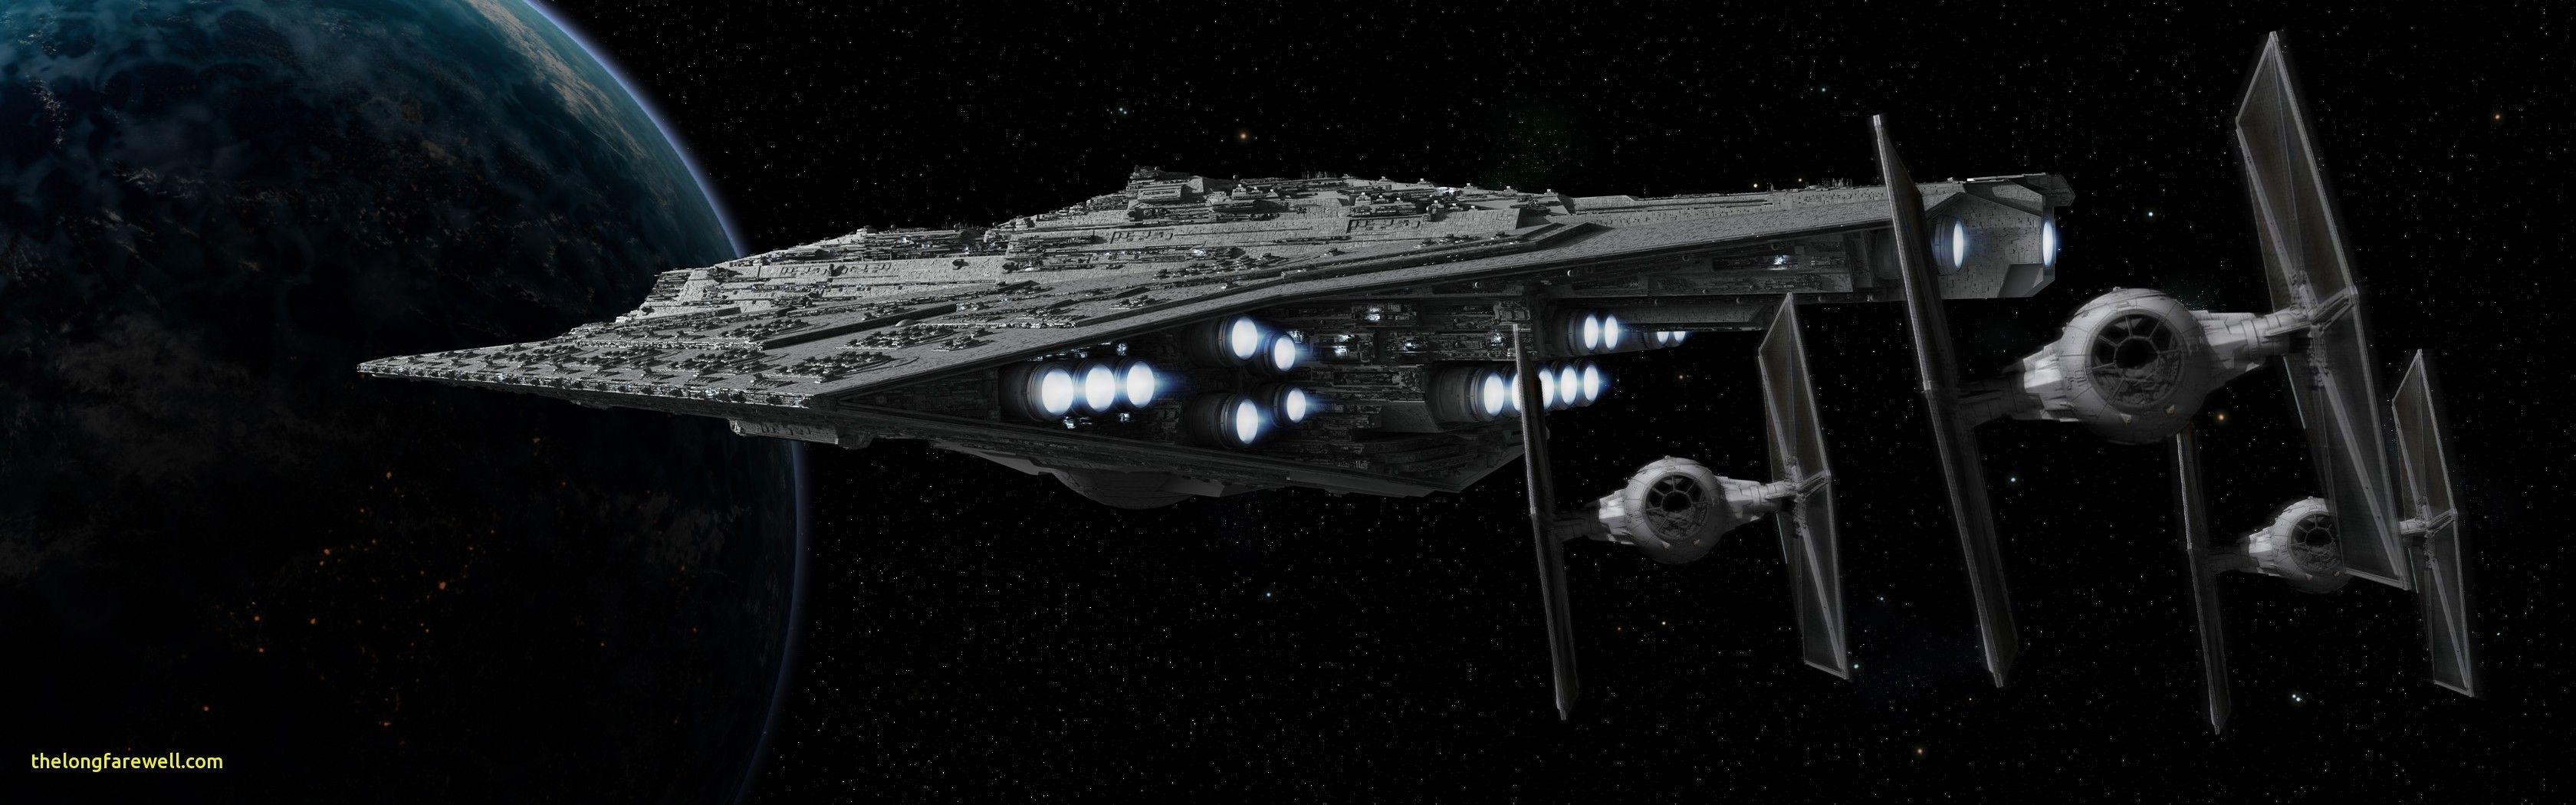 Beautiful Star Wars Triple Monitor Wallpaper